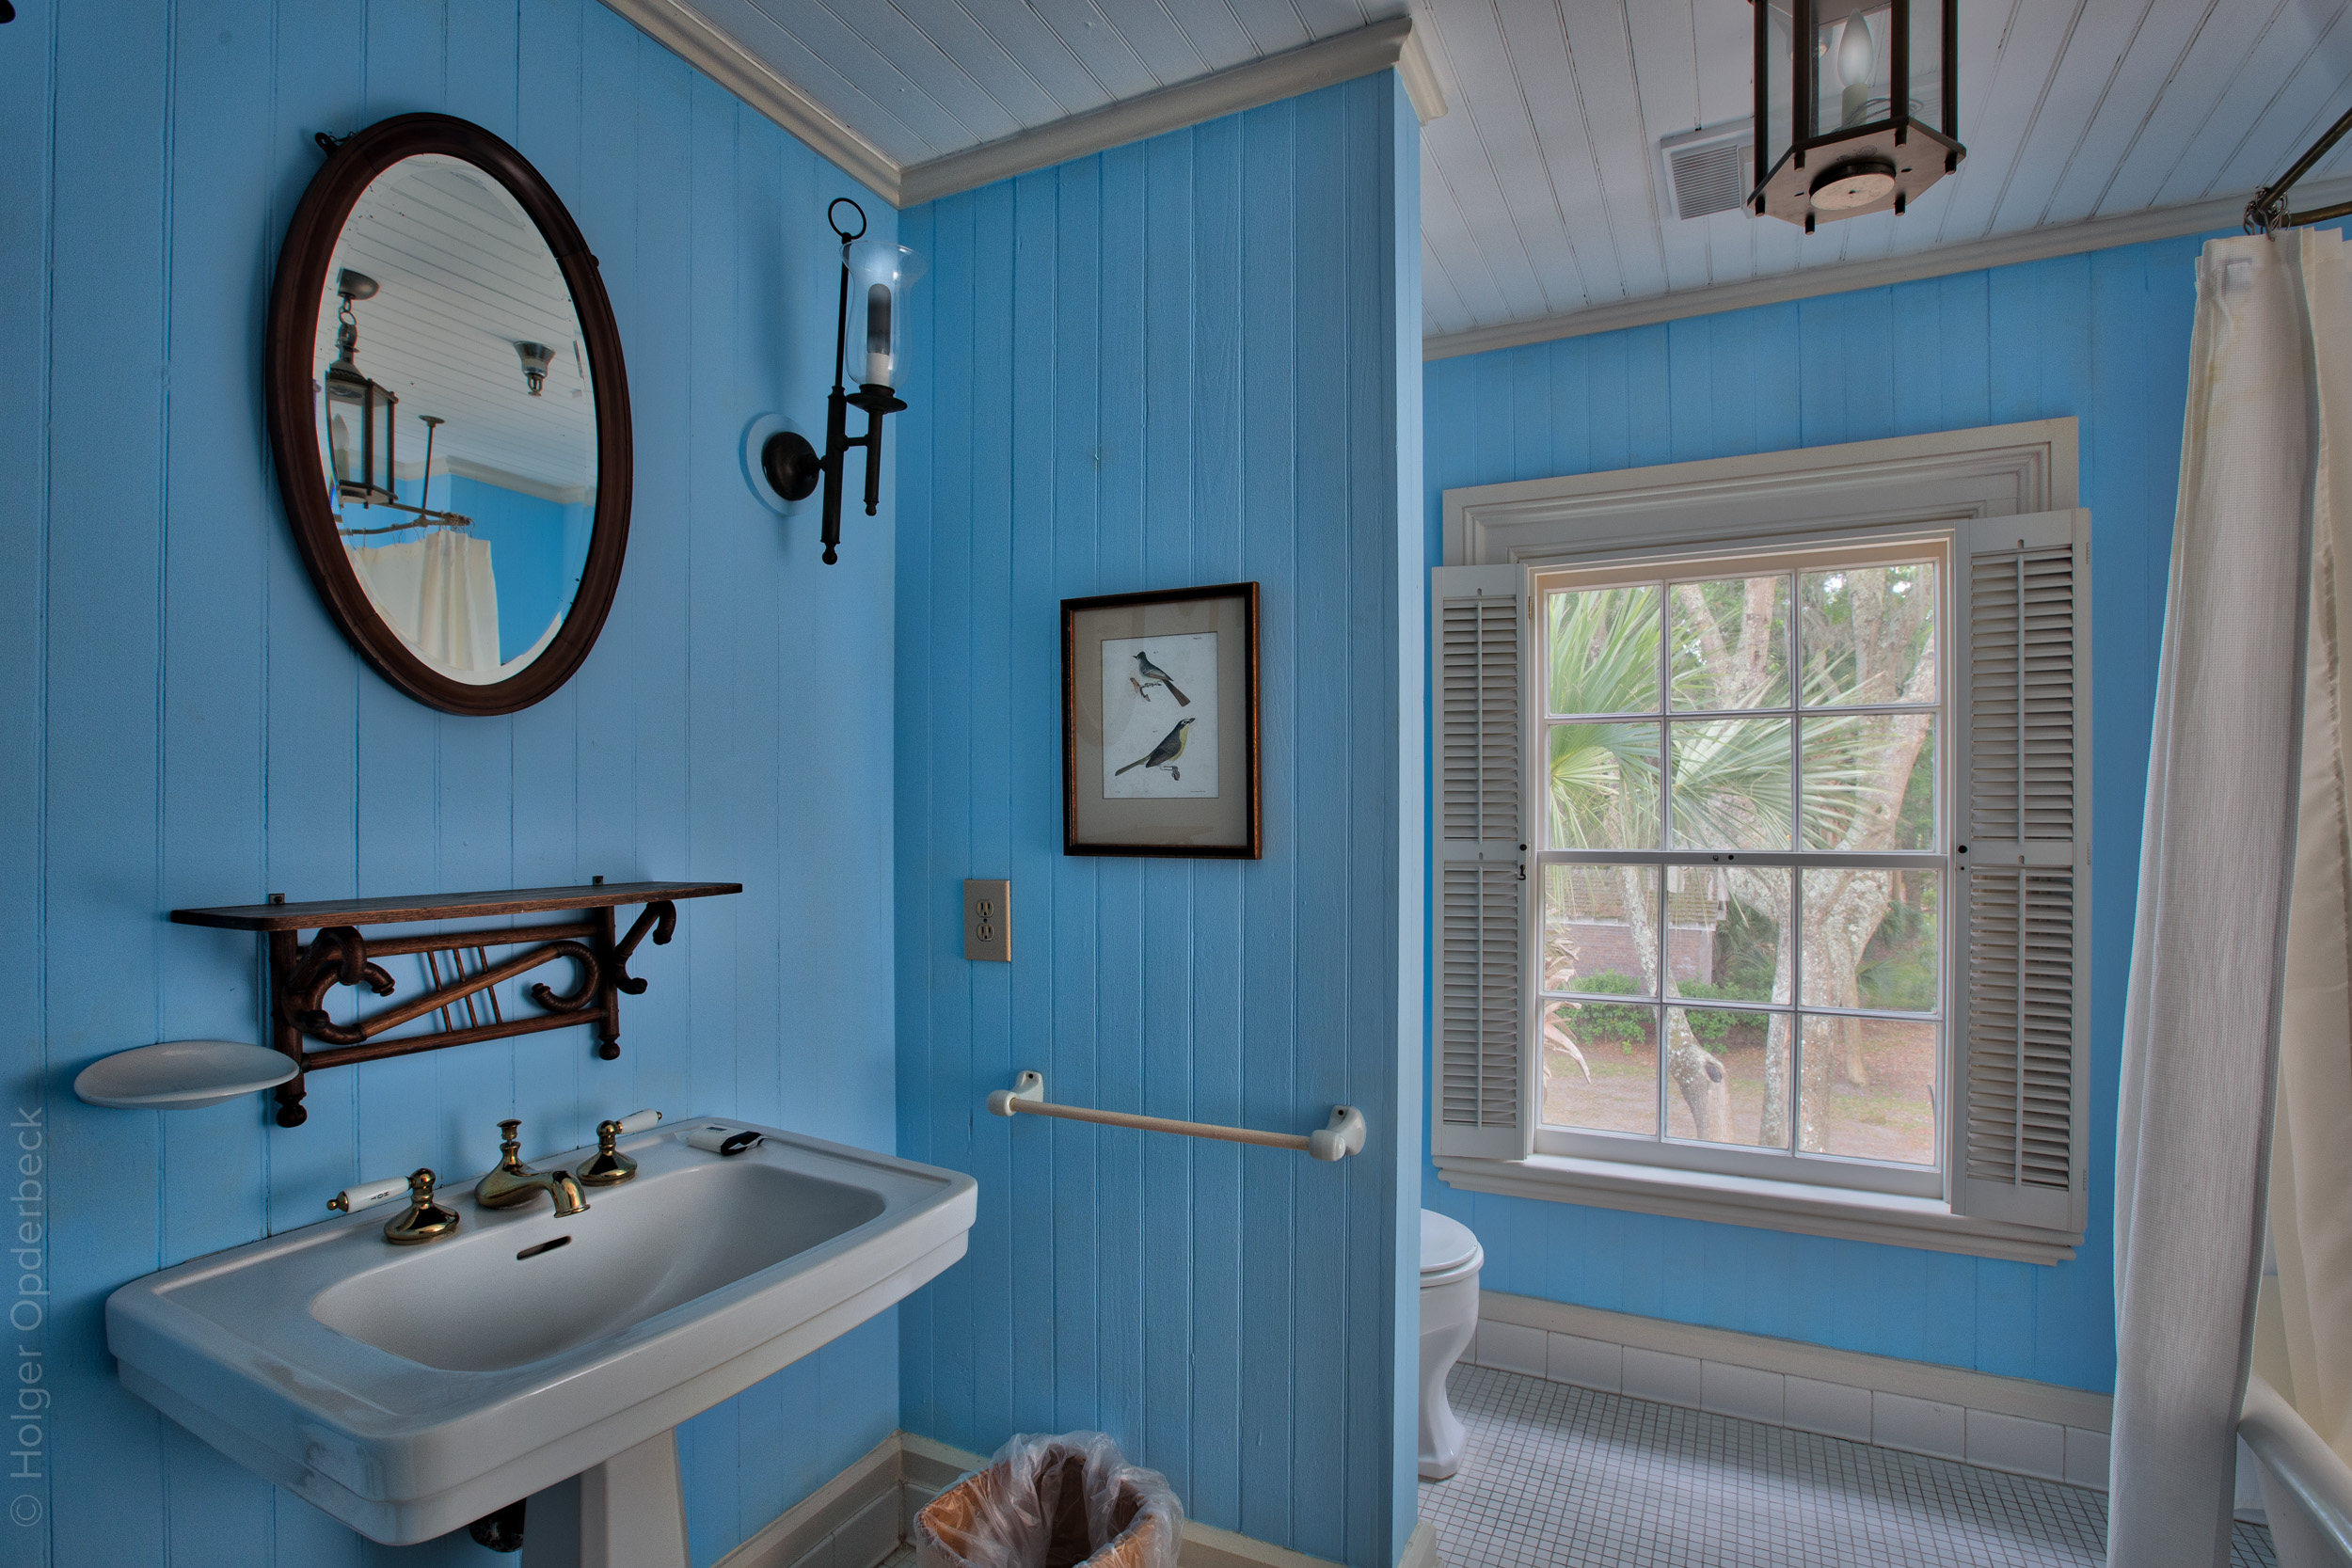 haig-bathroom.jpg